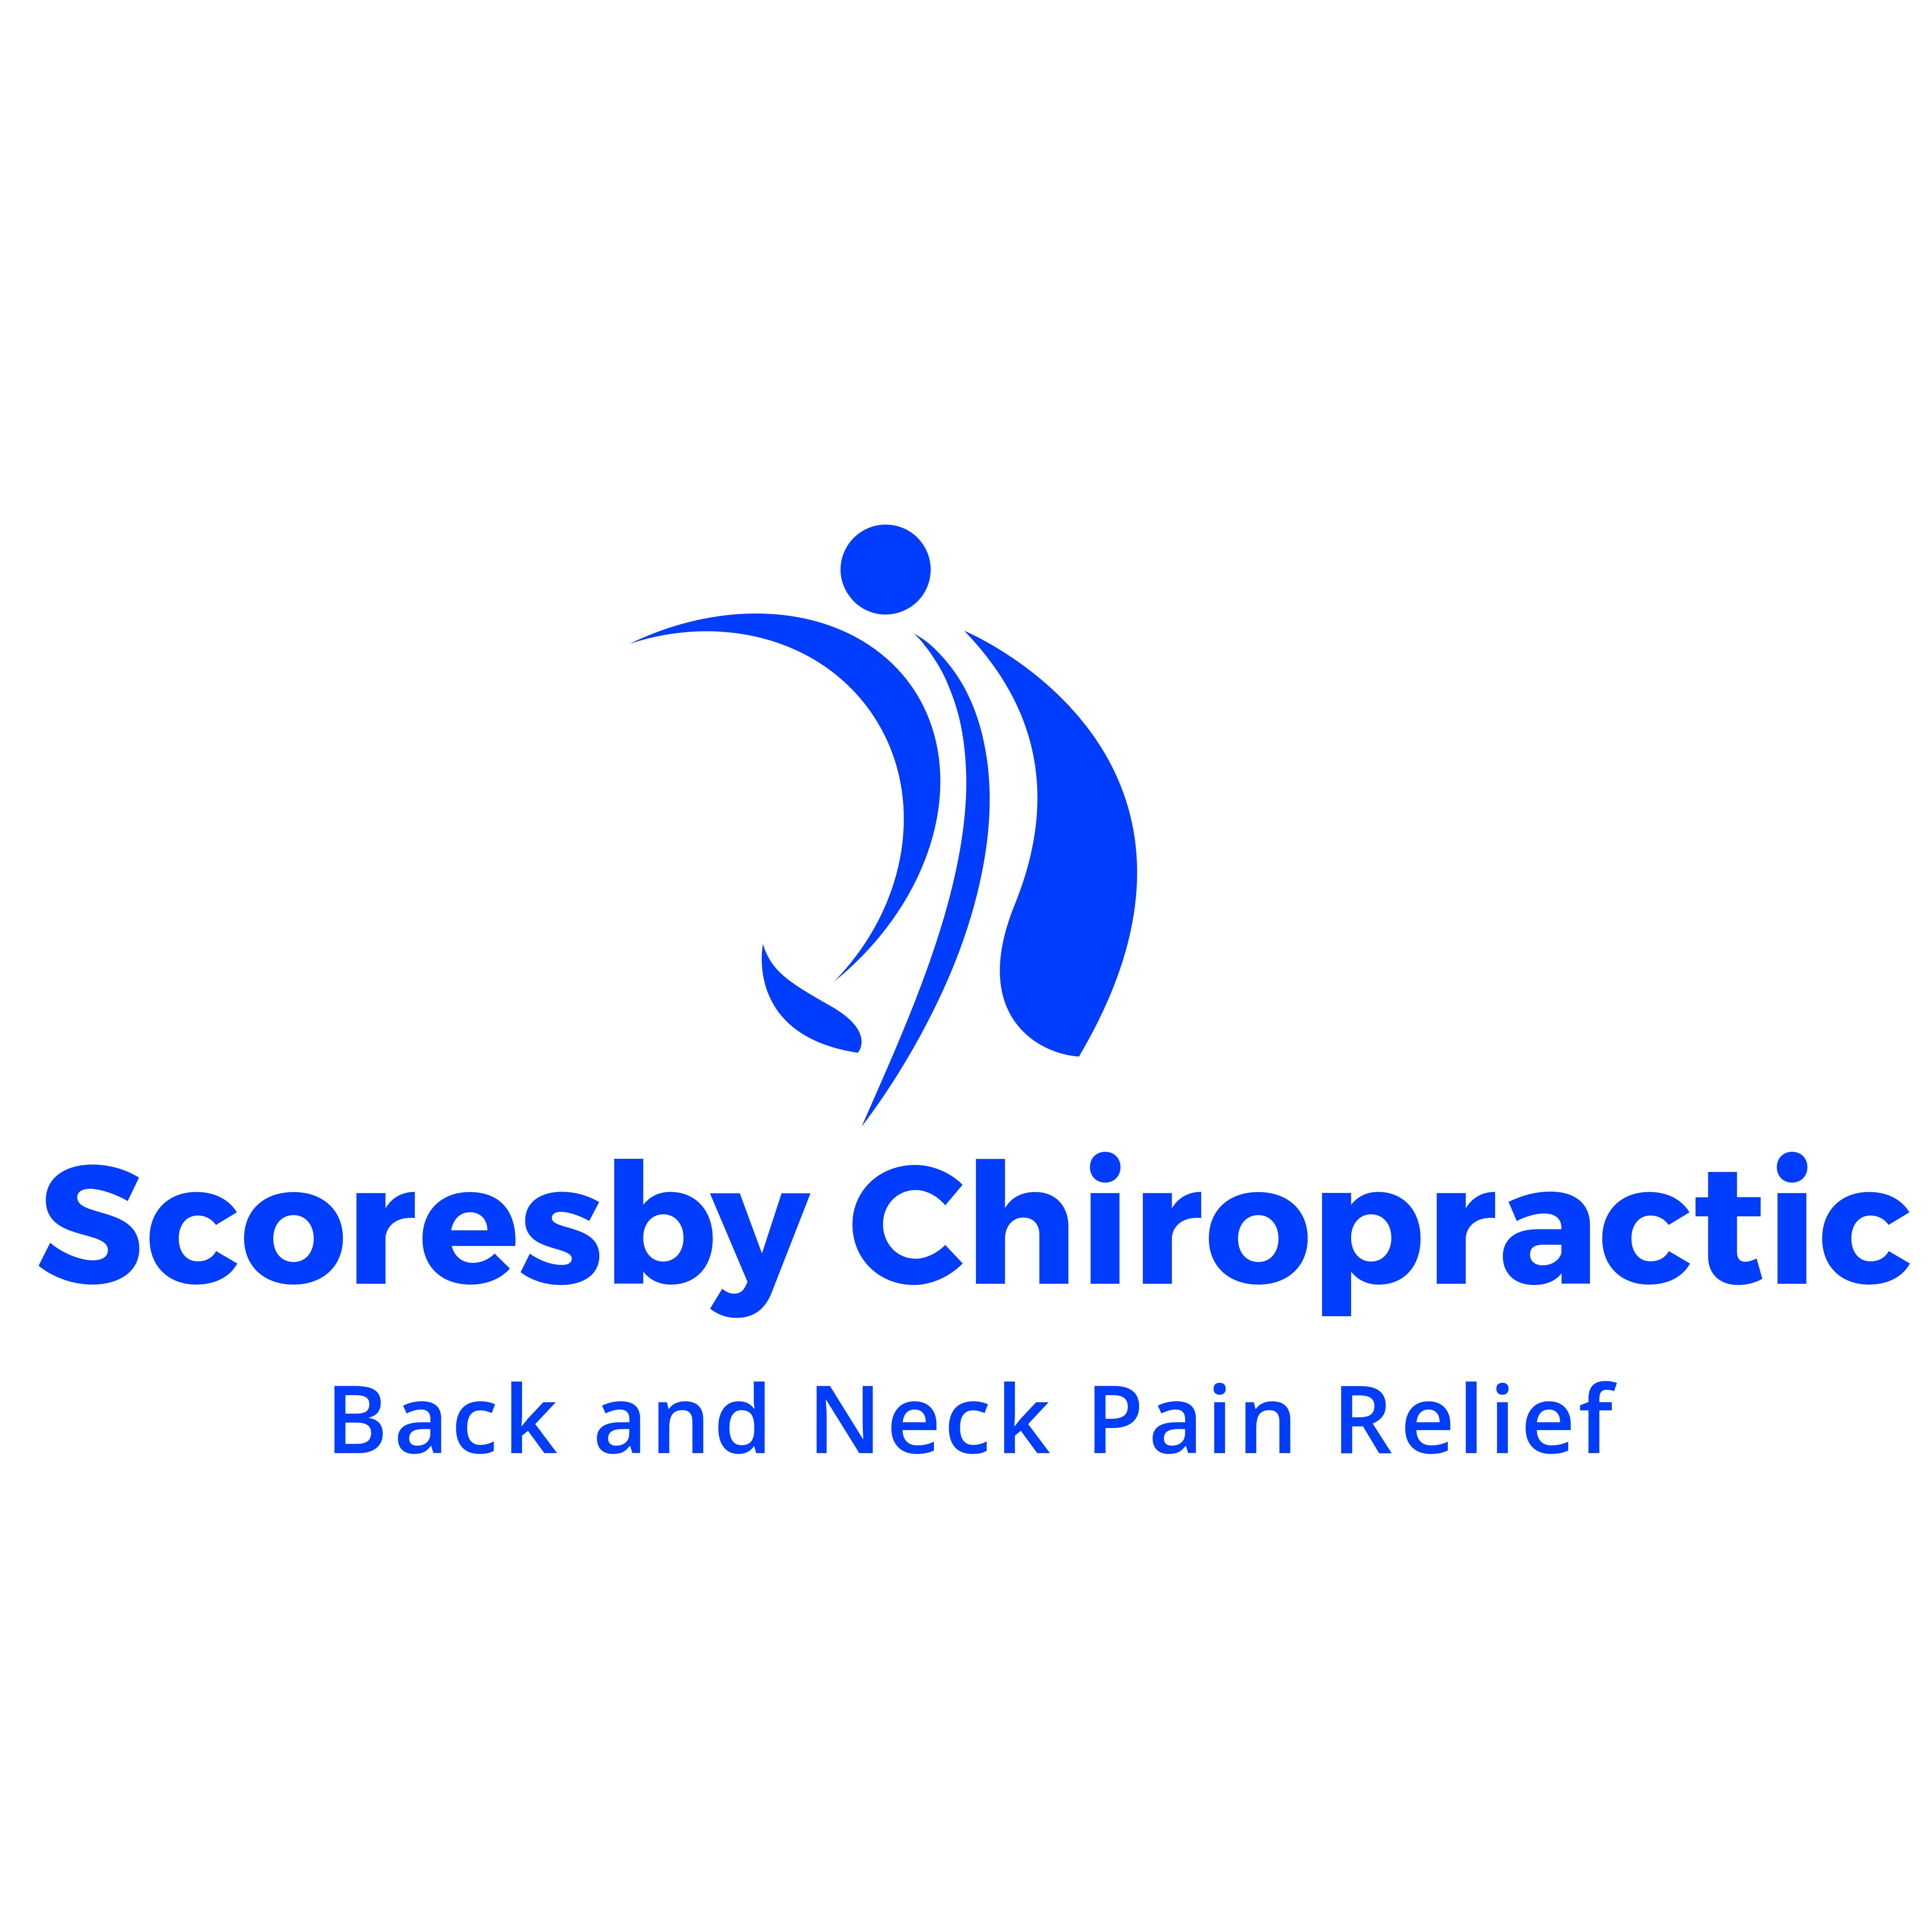 Scoresby Chiropractic